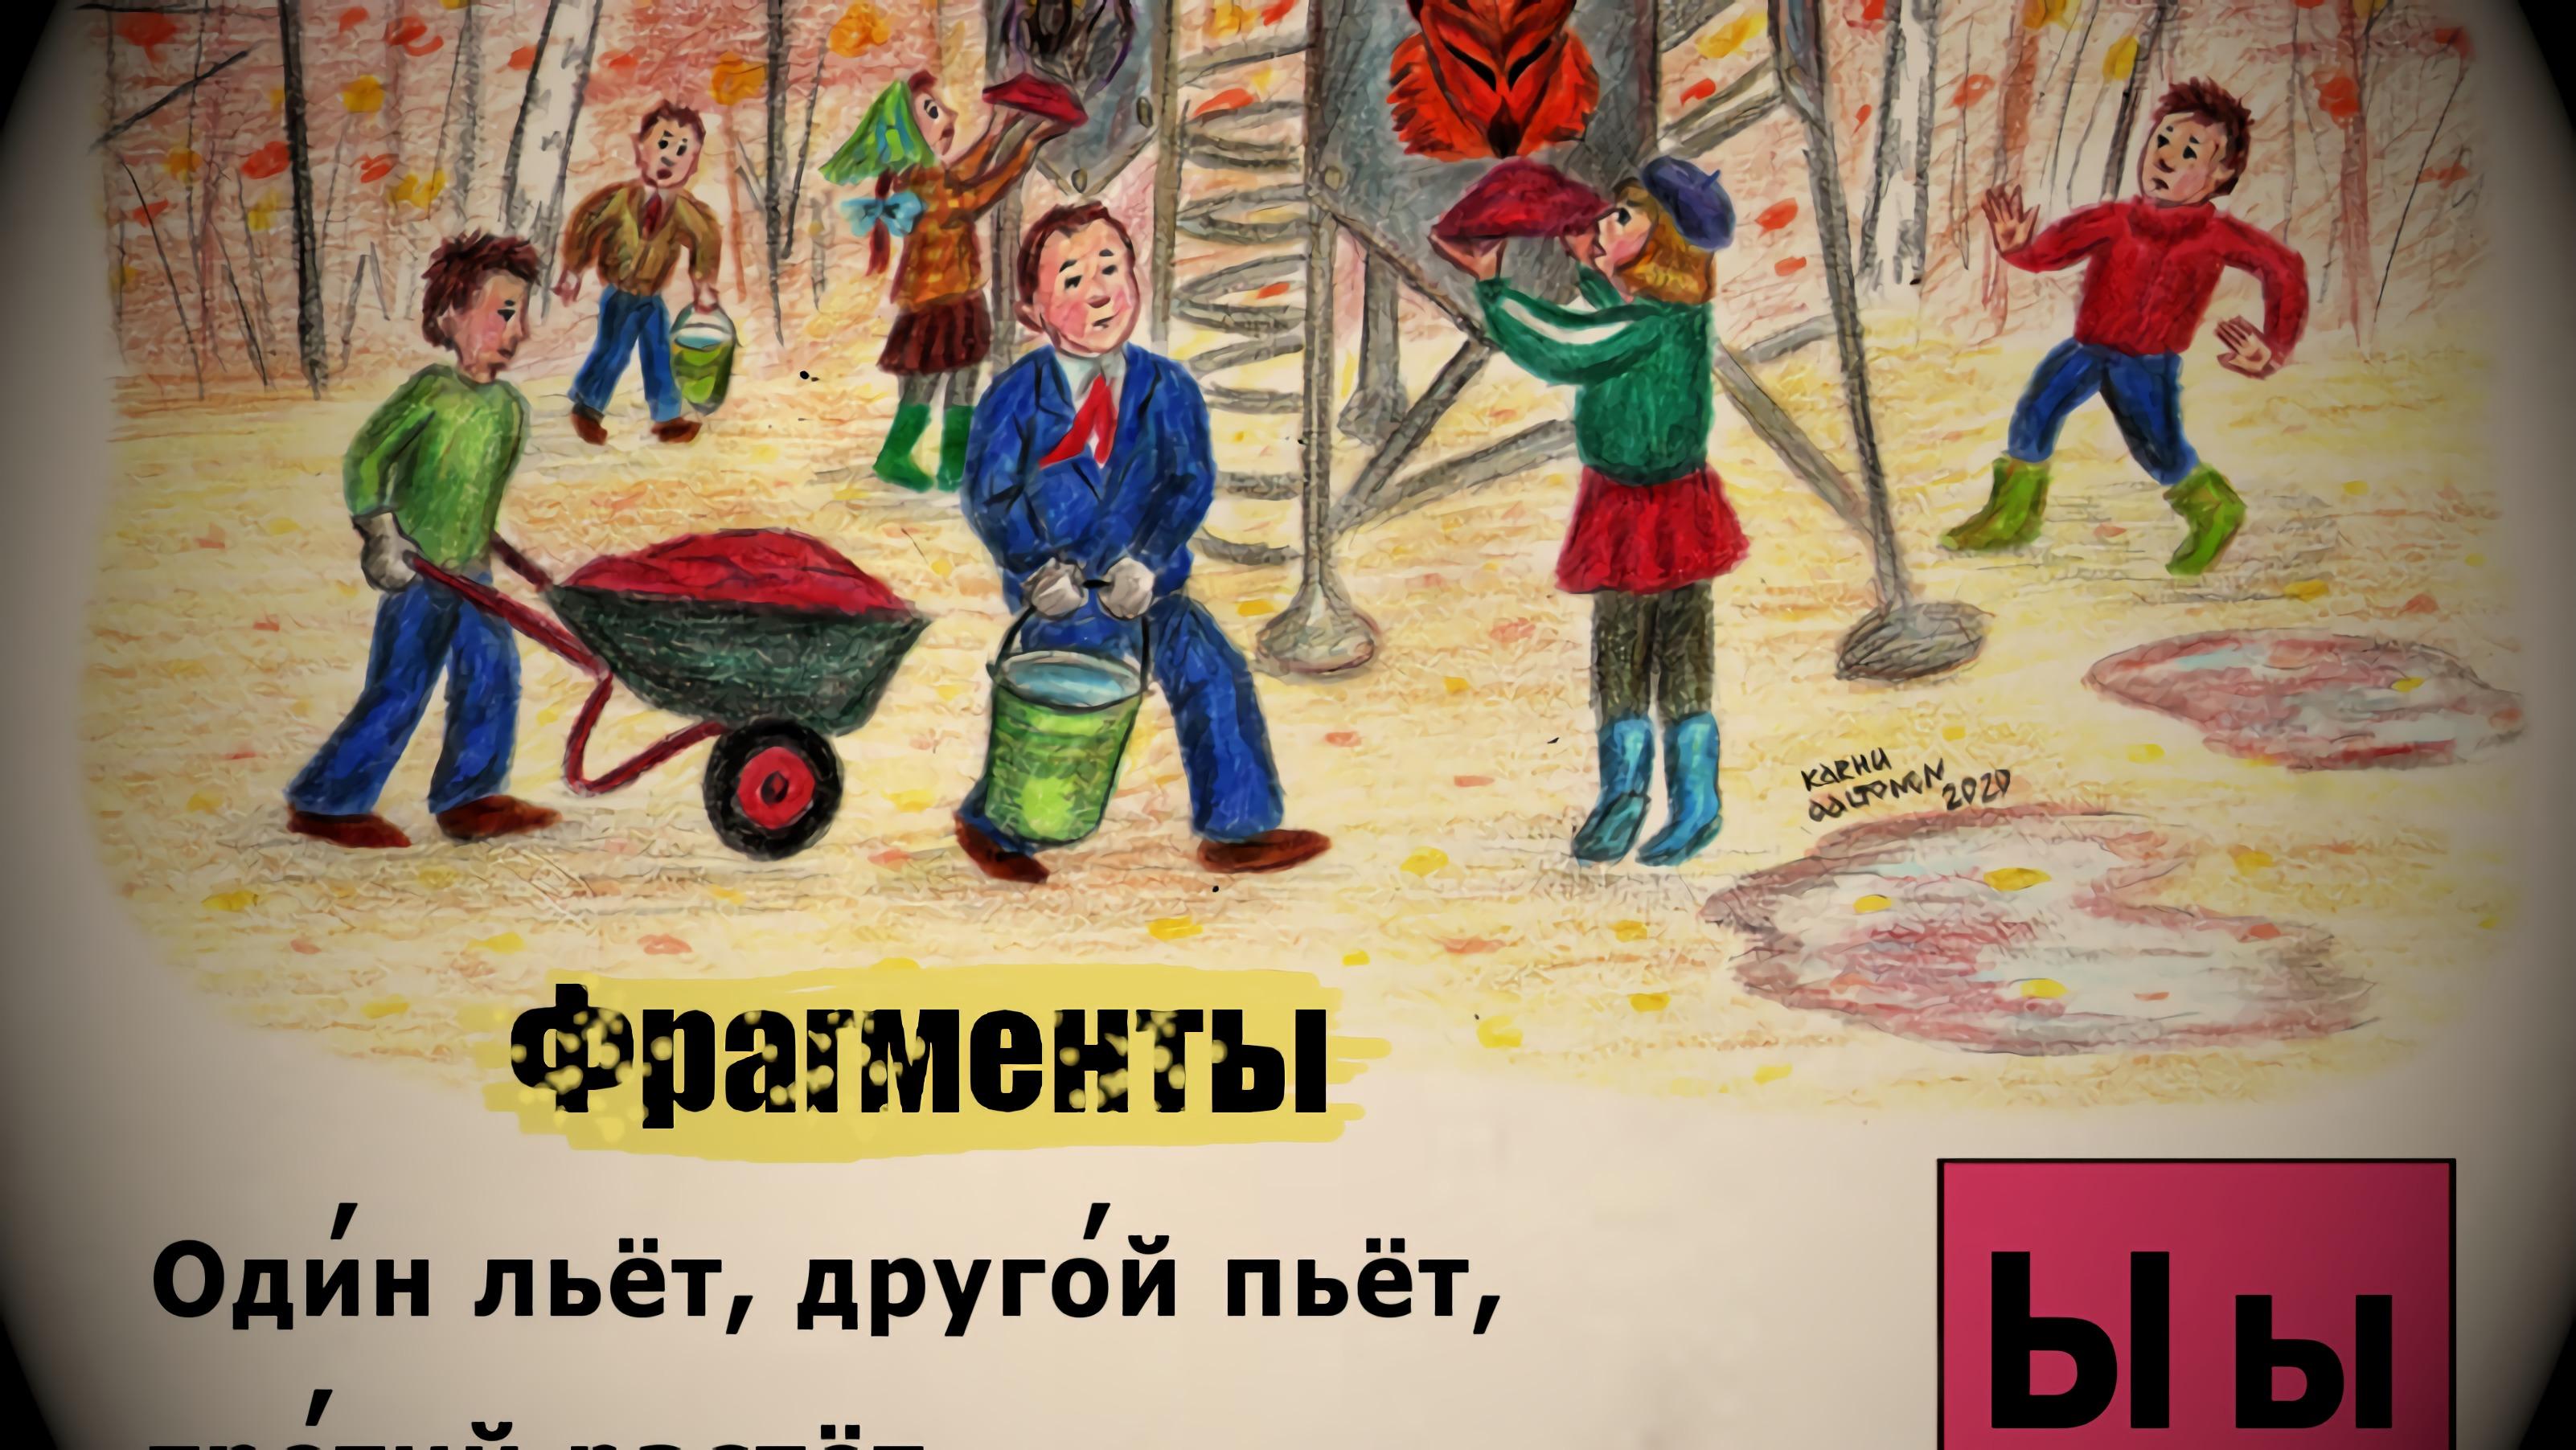 Фрагменты. Мракопедия. Novomestskii.mkv